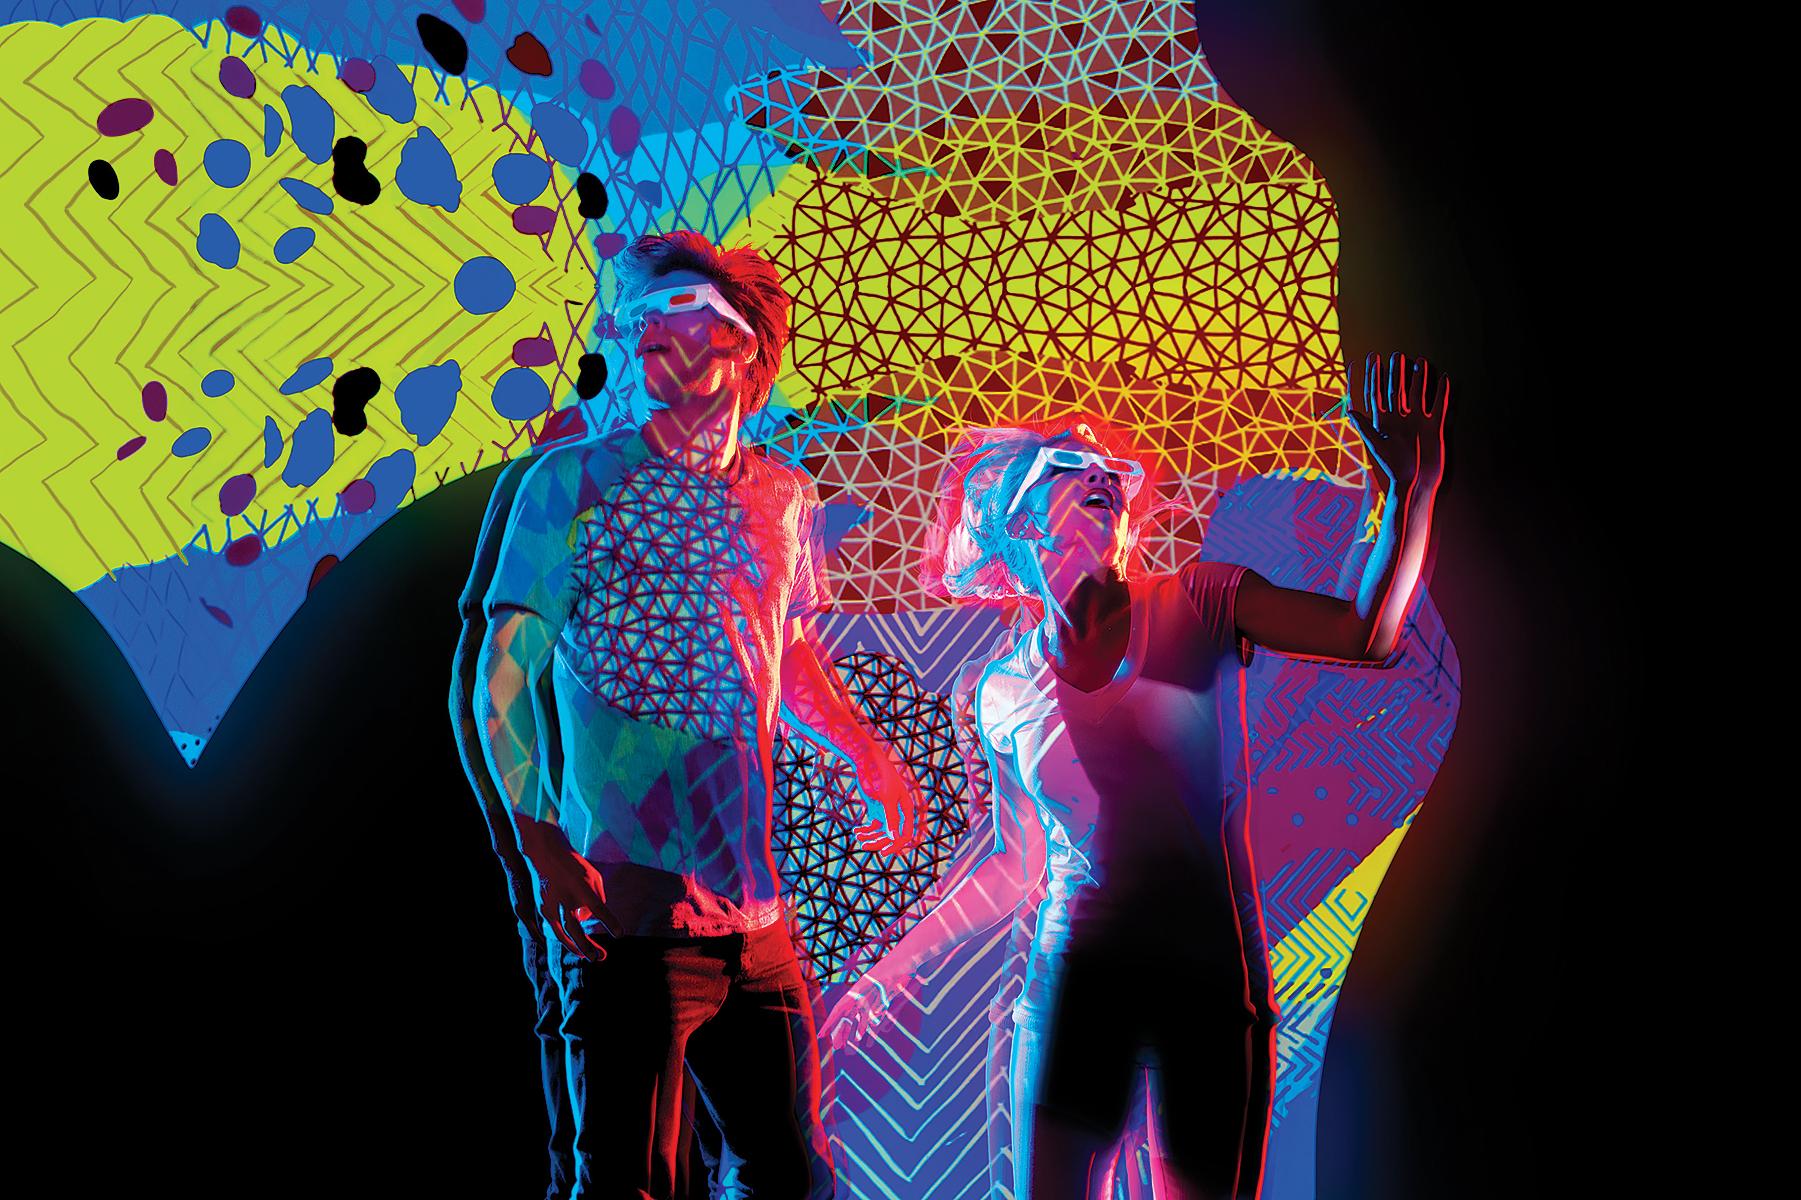 Smirnoff Midnight Circus: 3D